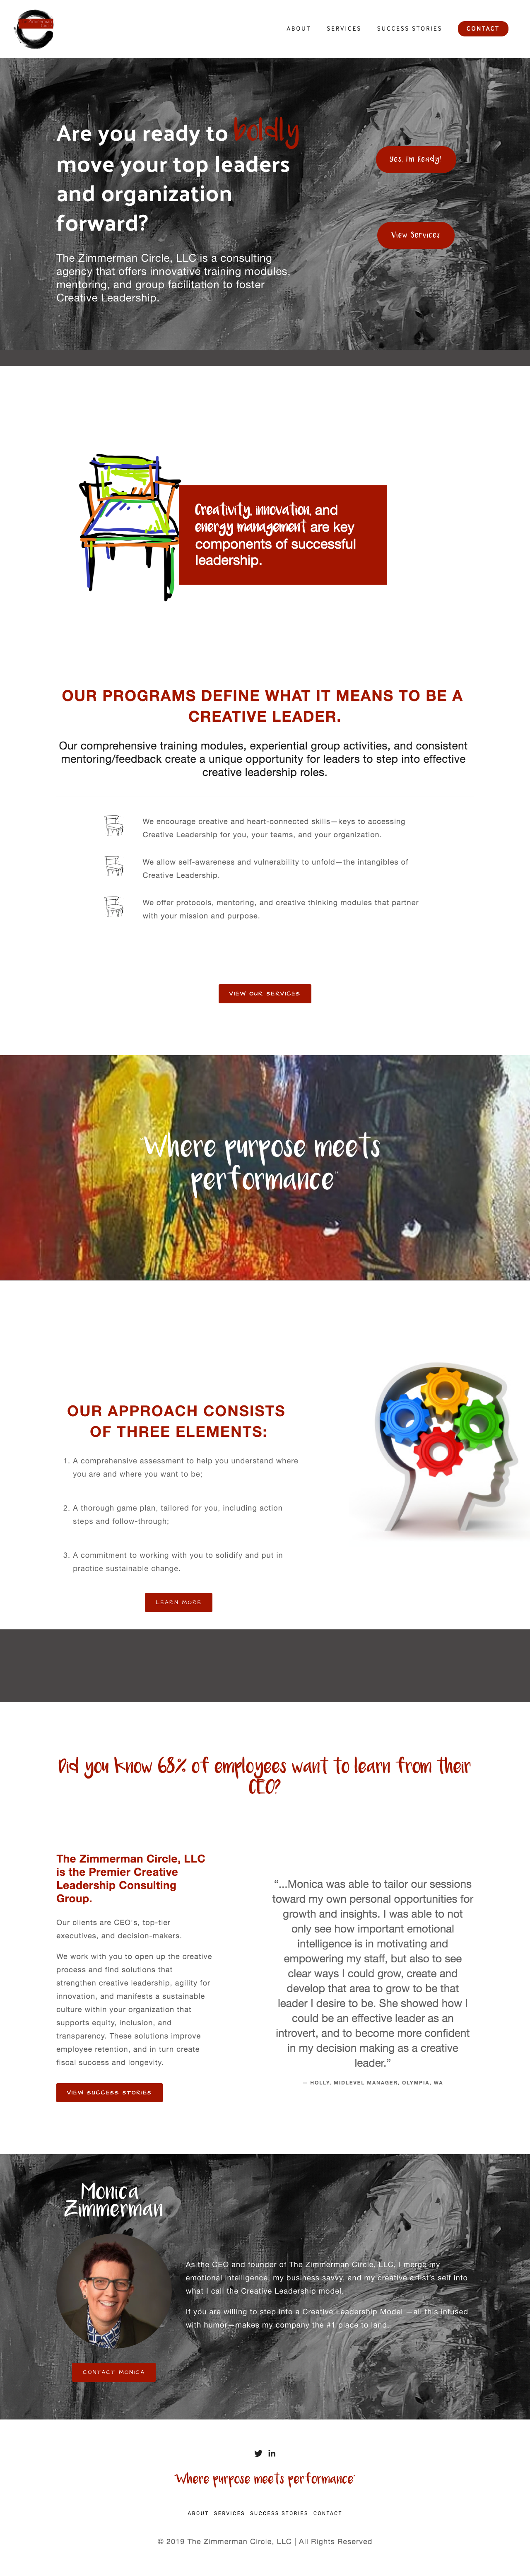 screencapture-zimmermancircle-2019-10-08-19_14_11.png